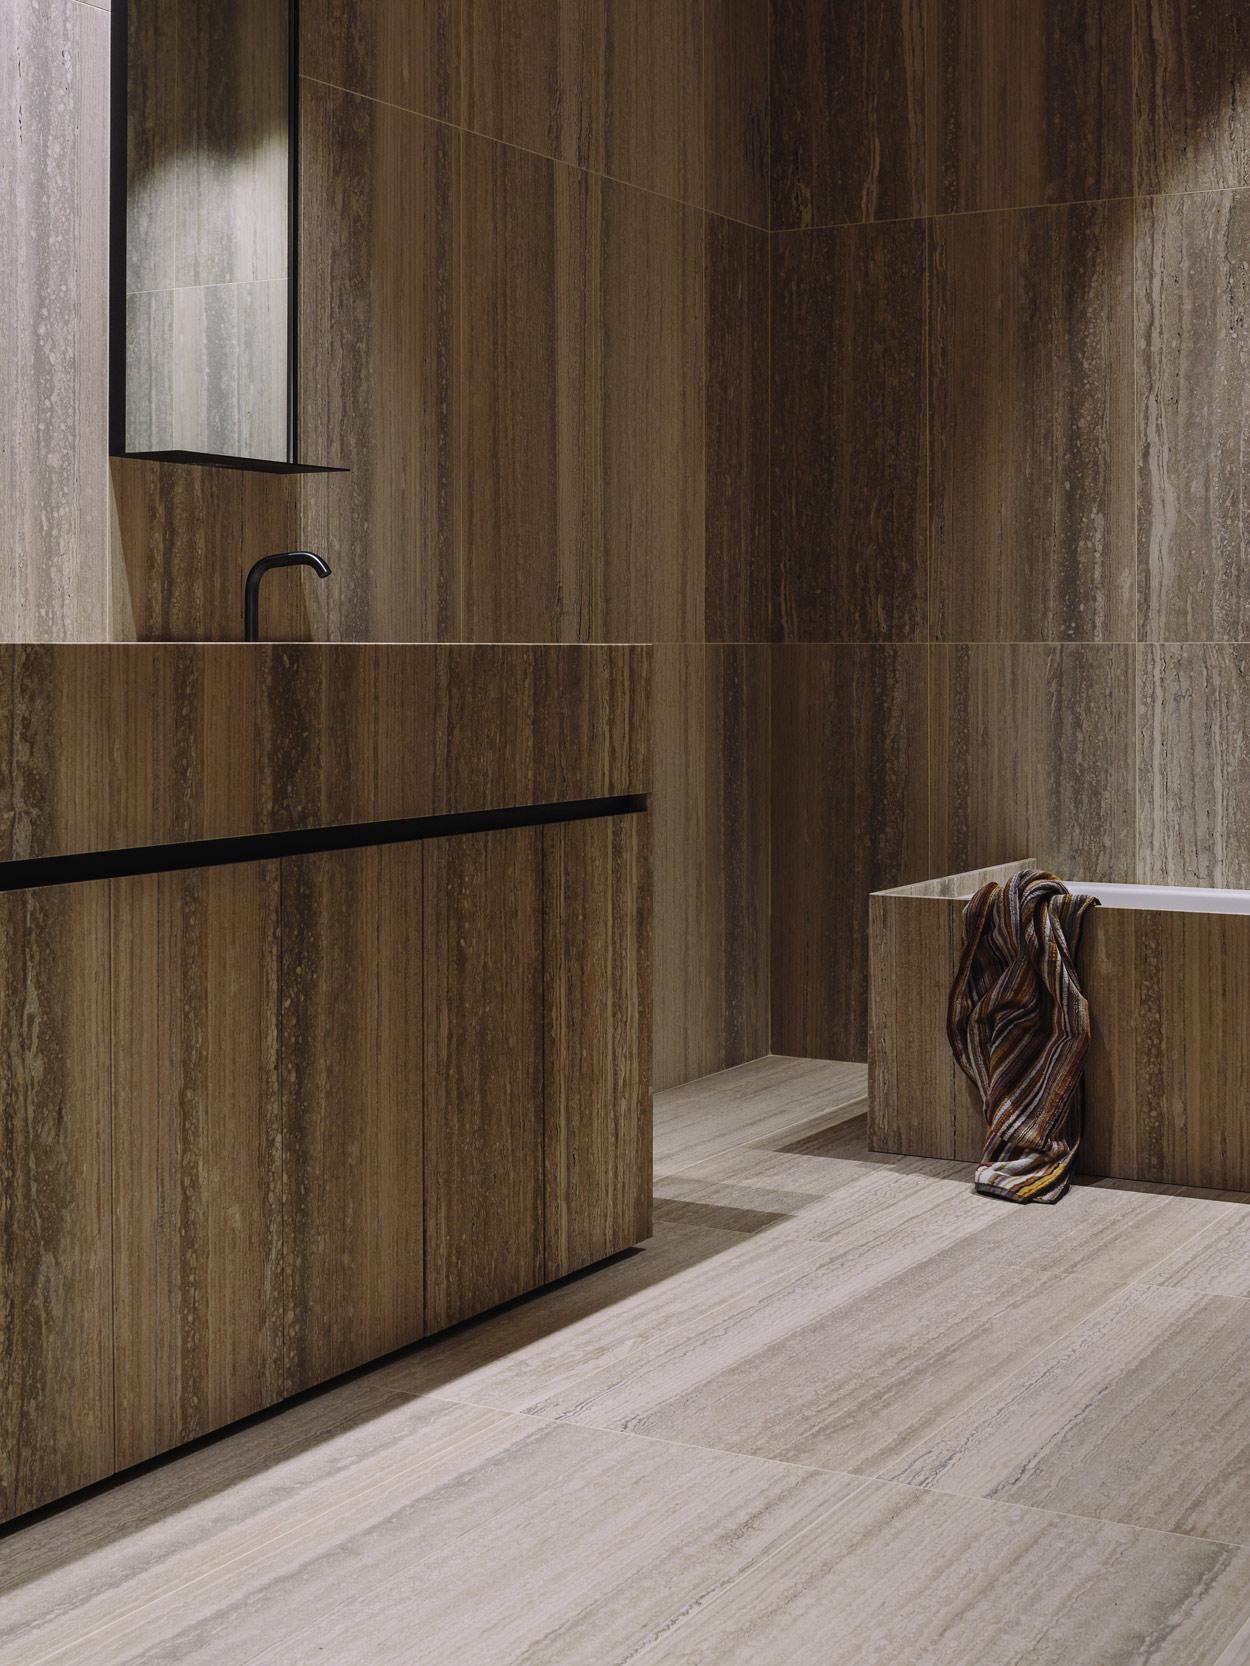 The International 品牌VIS设计欣赏,所属行业类别:地产、建筑、建材、物业 - 任刚 · Ren Gang 世界设计 · 设计世界